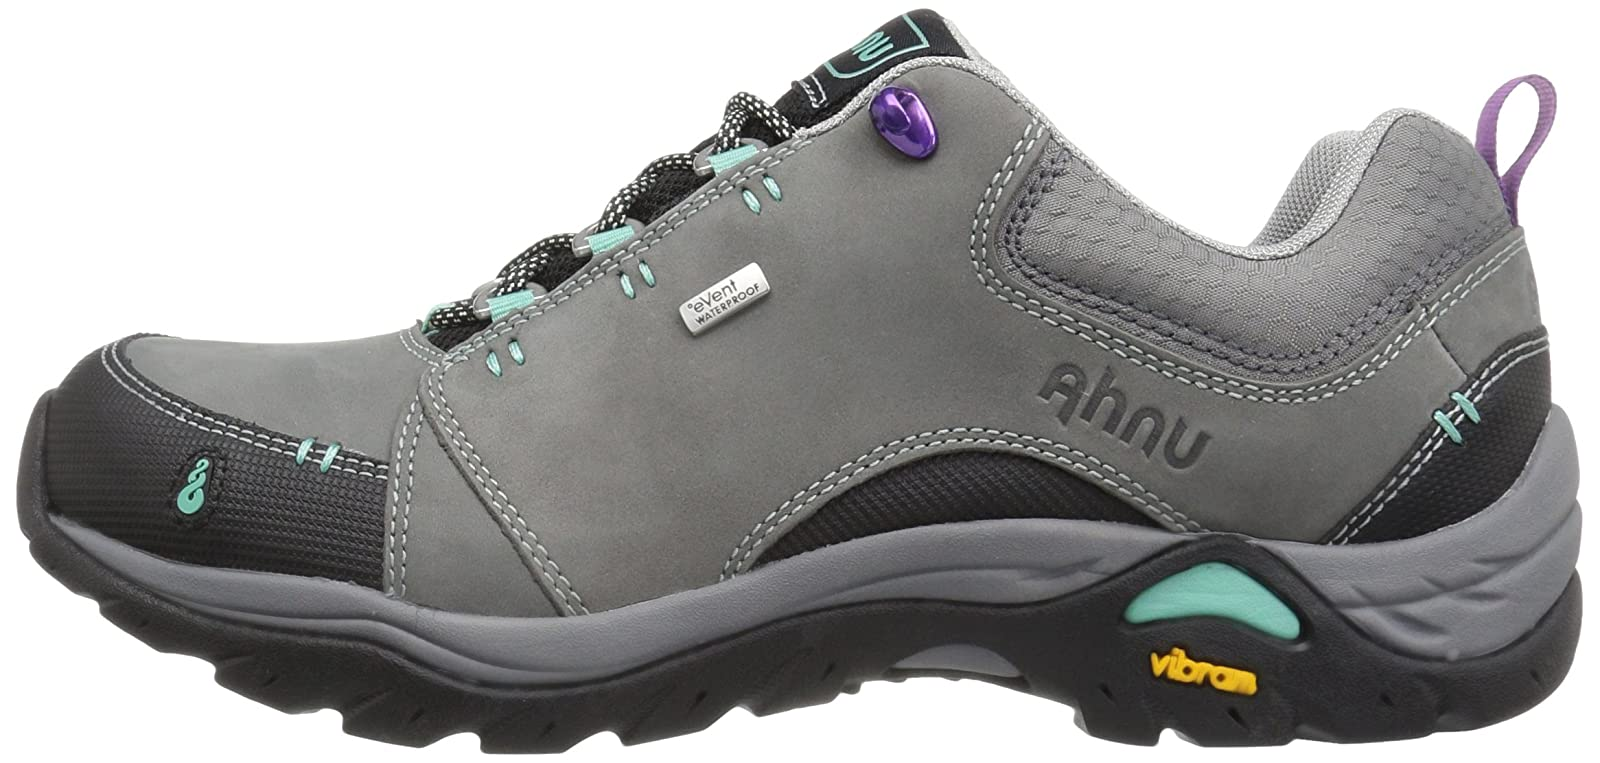 Ahnu Women's Montara II Hiking Shoe Black 6 B(M) US - 5